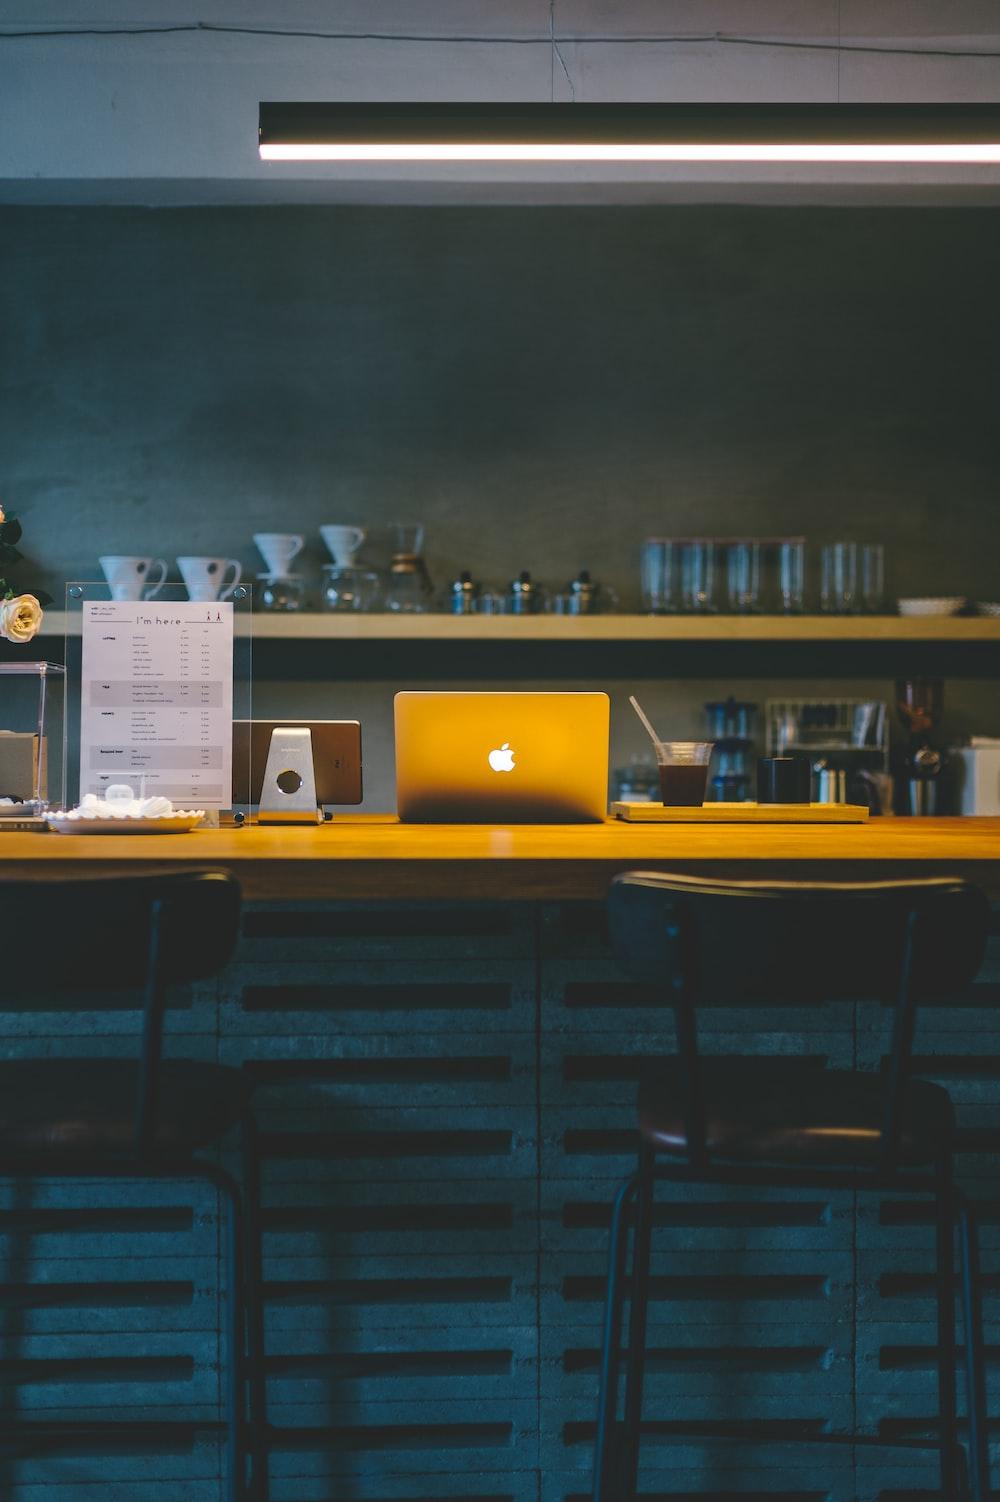 MacBook on table